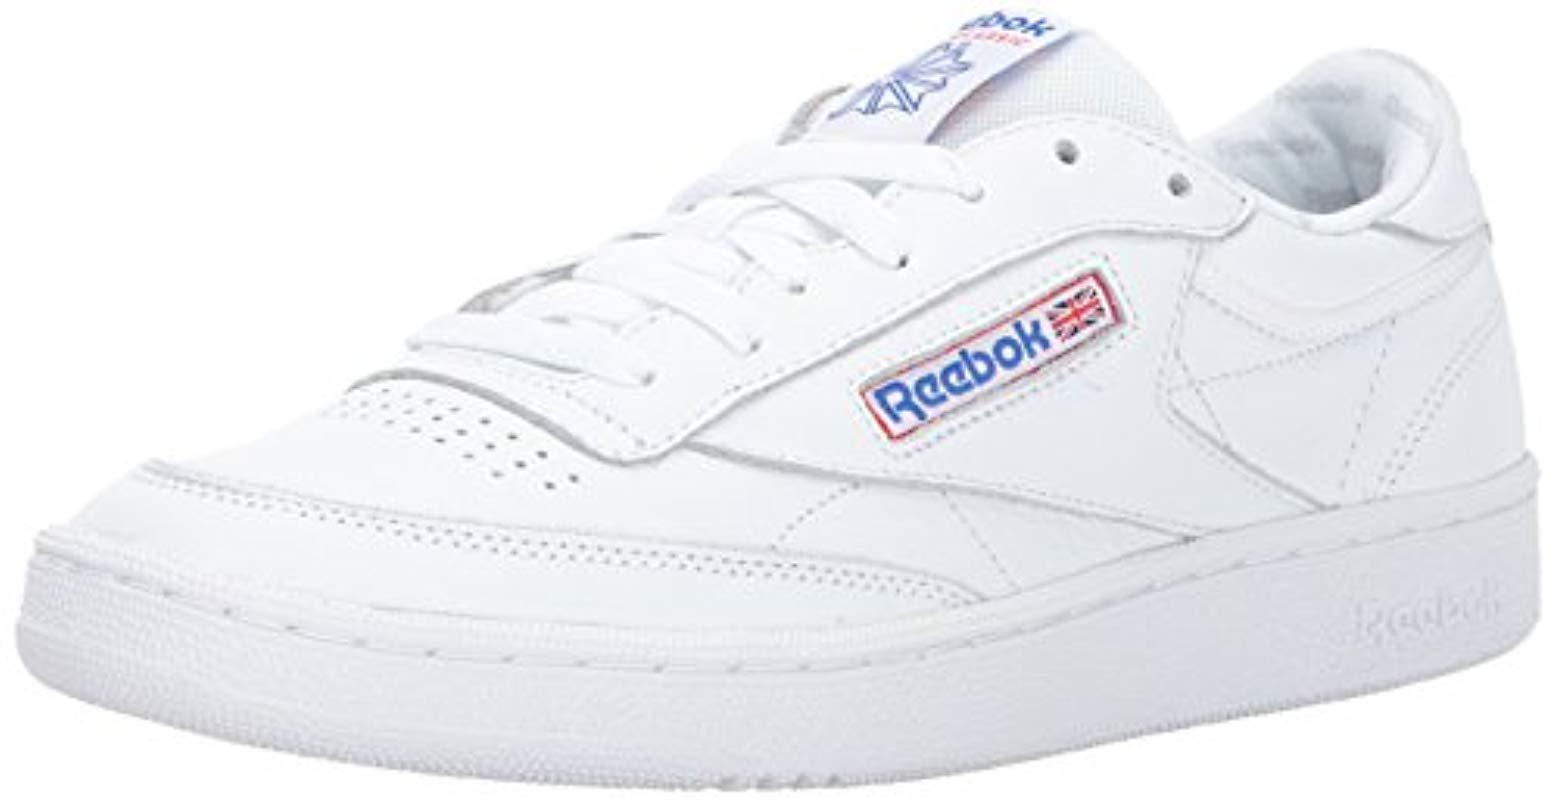 d0b1e0c9d3ab Lyst - Reebok Classic Renaissance Fashion Sneaker in White for Men